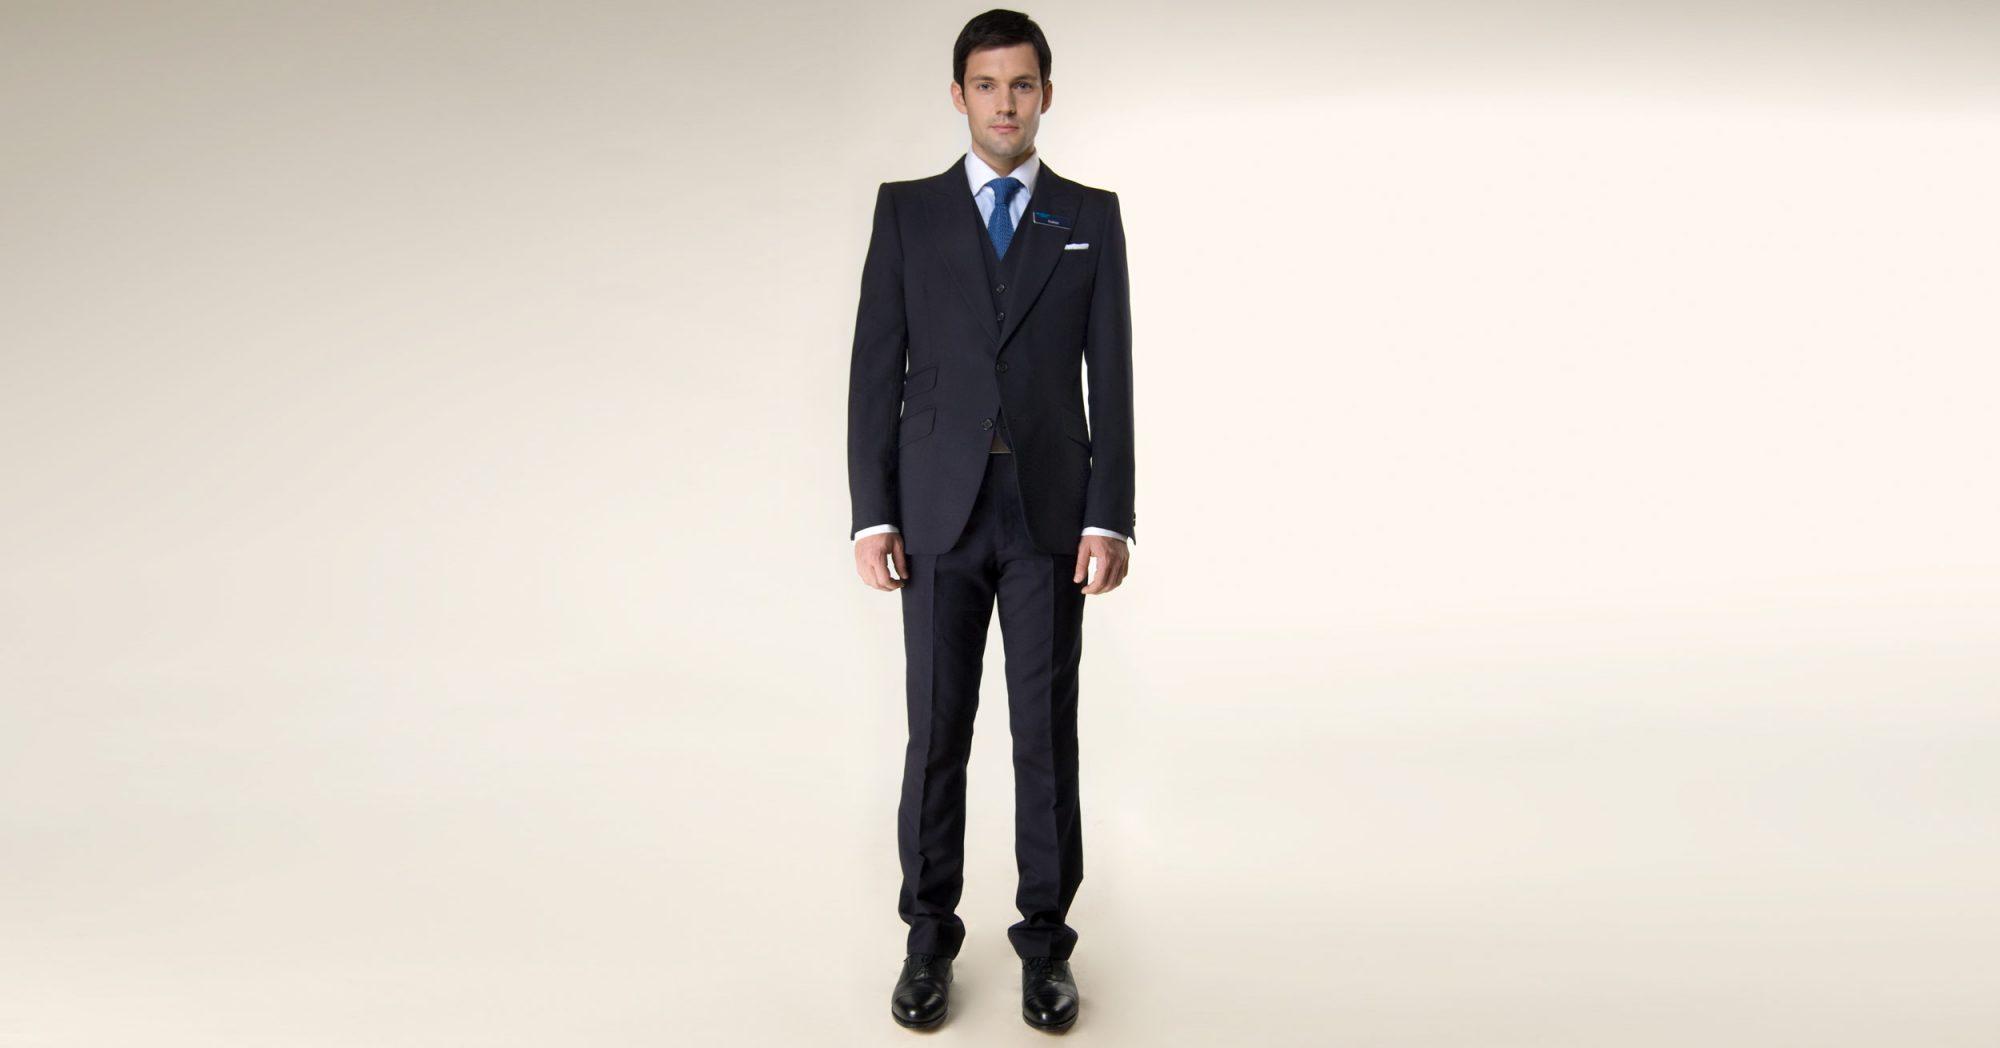 Barclays-Reception-Male